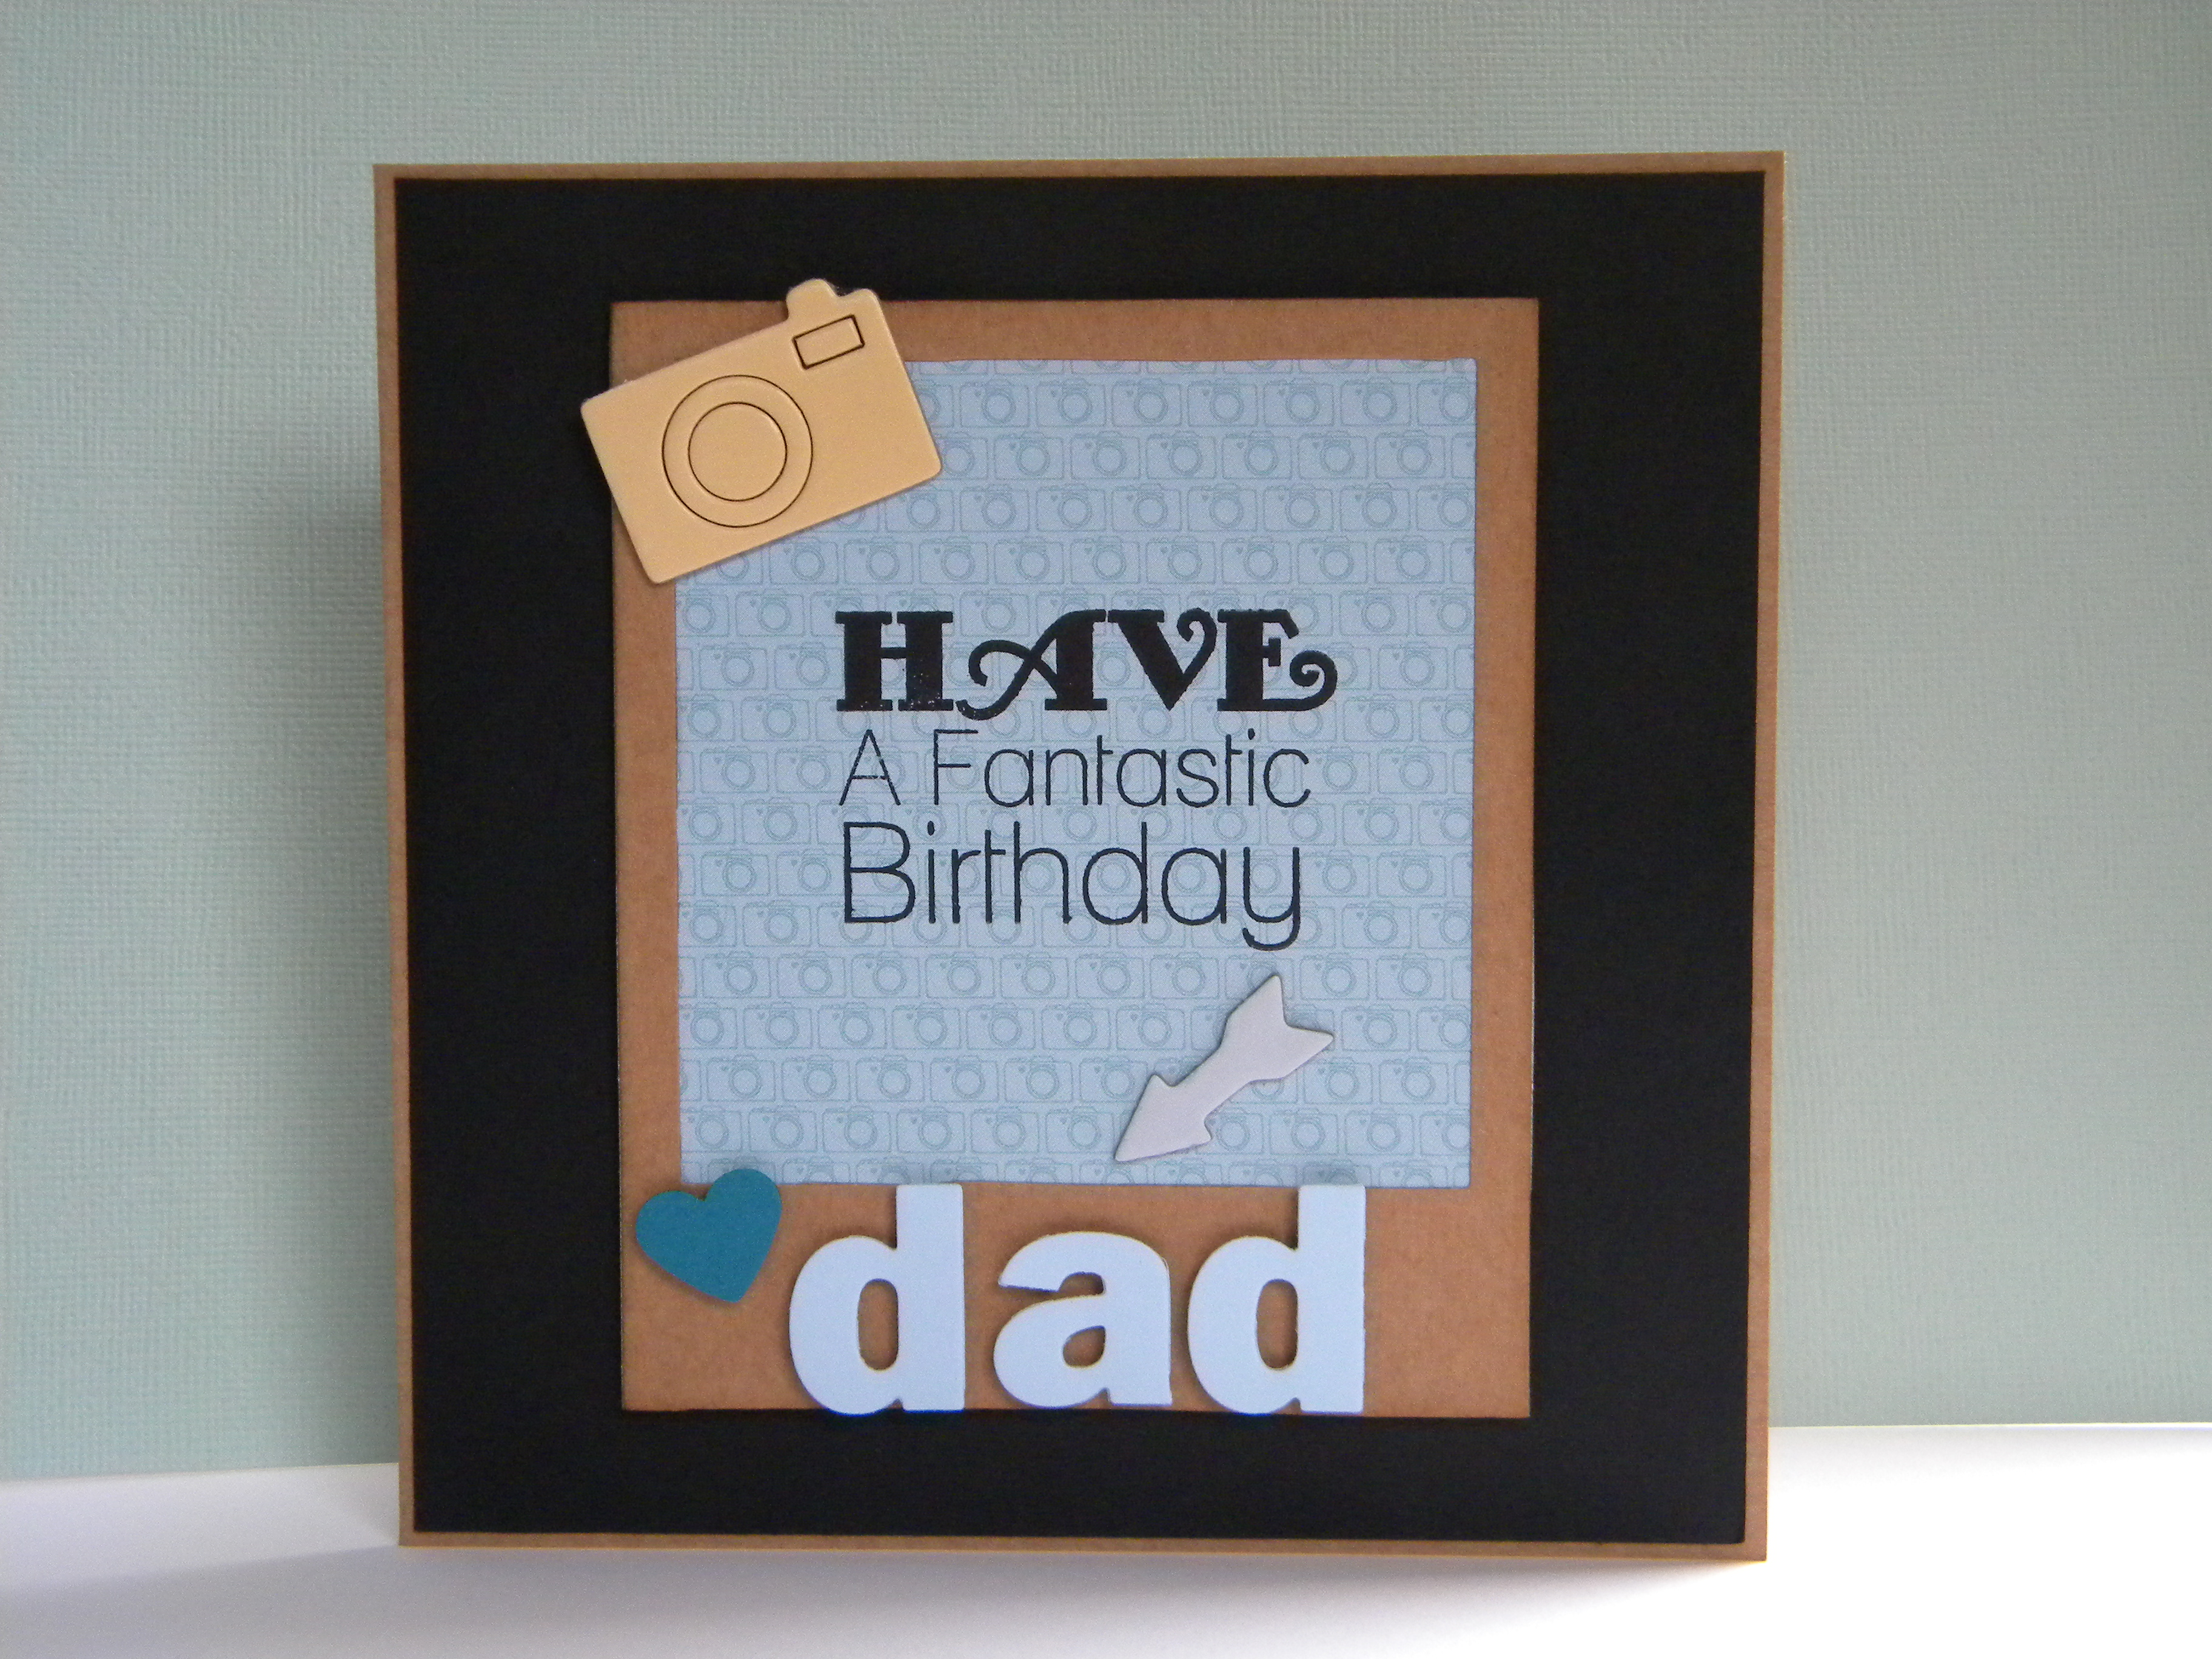 Birthday Cards for Dads – Homemade Card Ideas for Birthdays